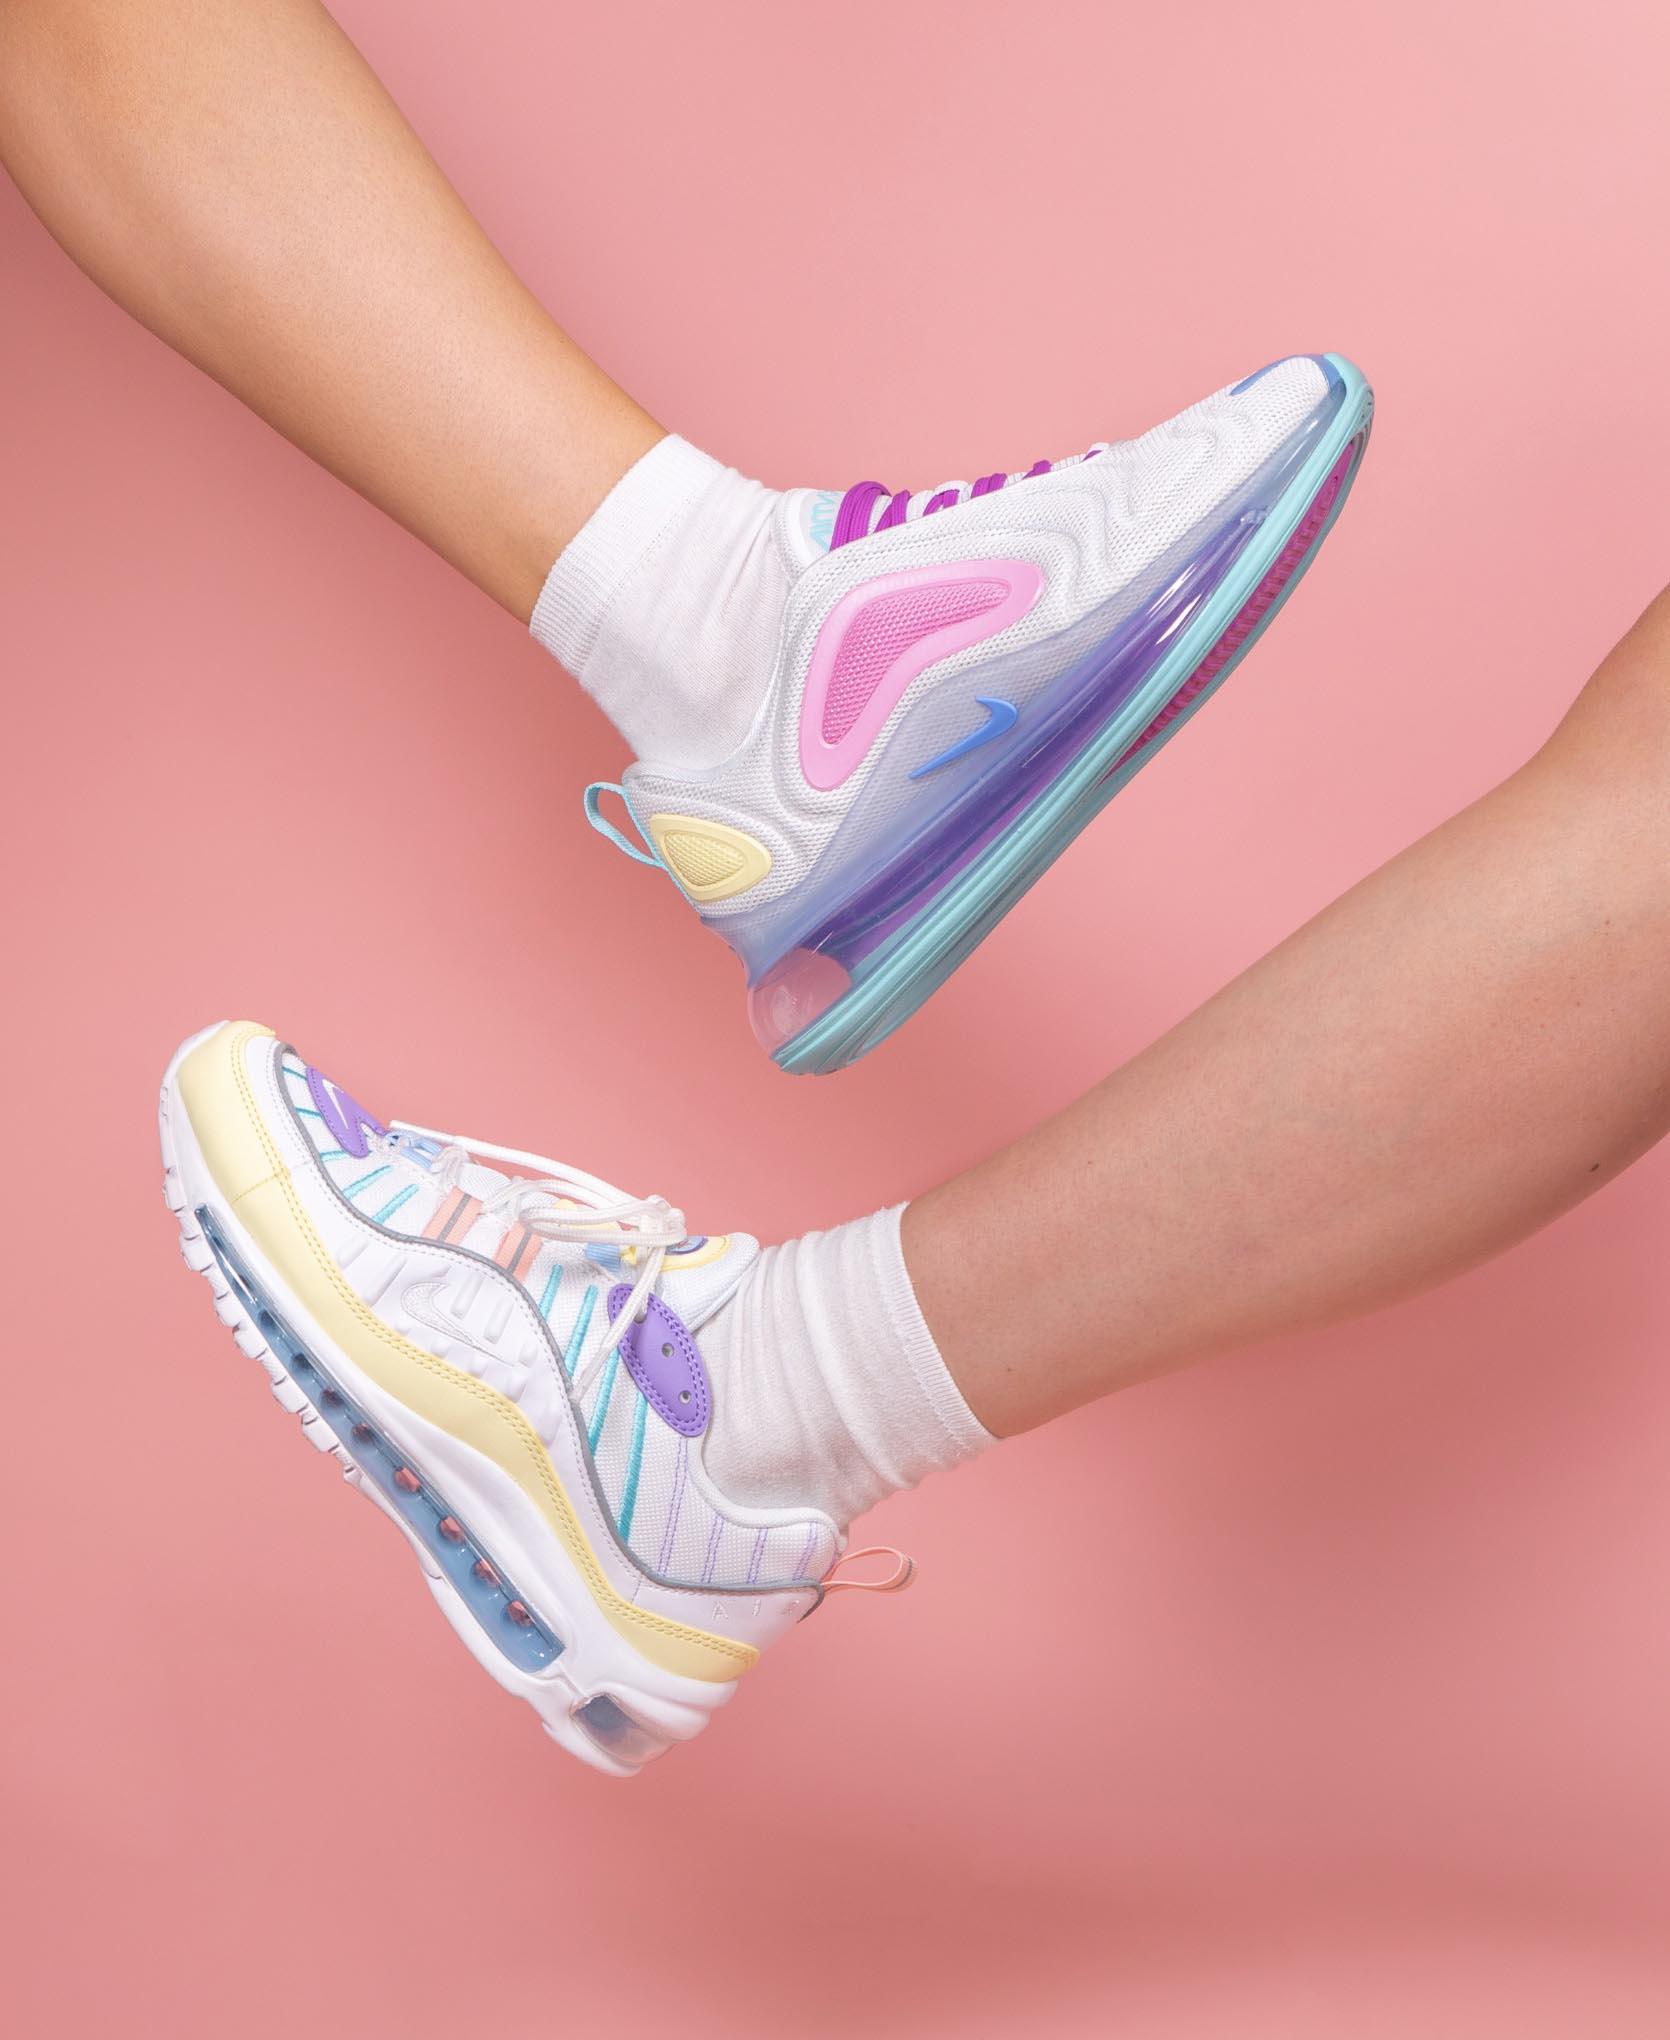 An Exclusive Closer Look At The Nike Air Max 98 & Air Max 720 Pastel Pack